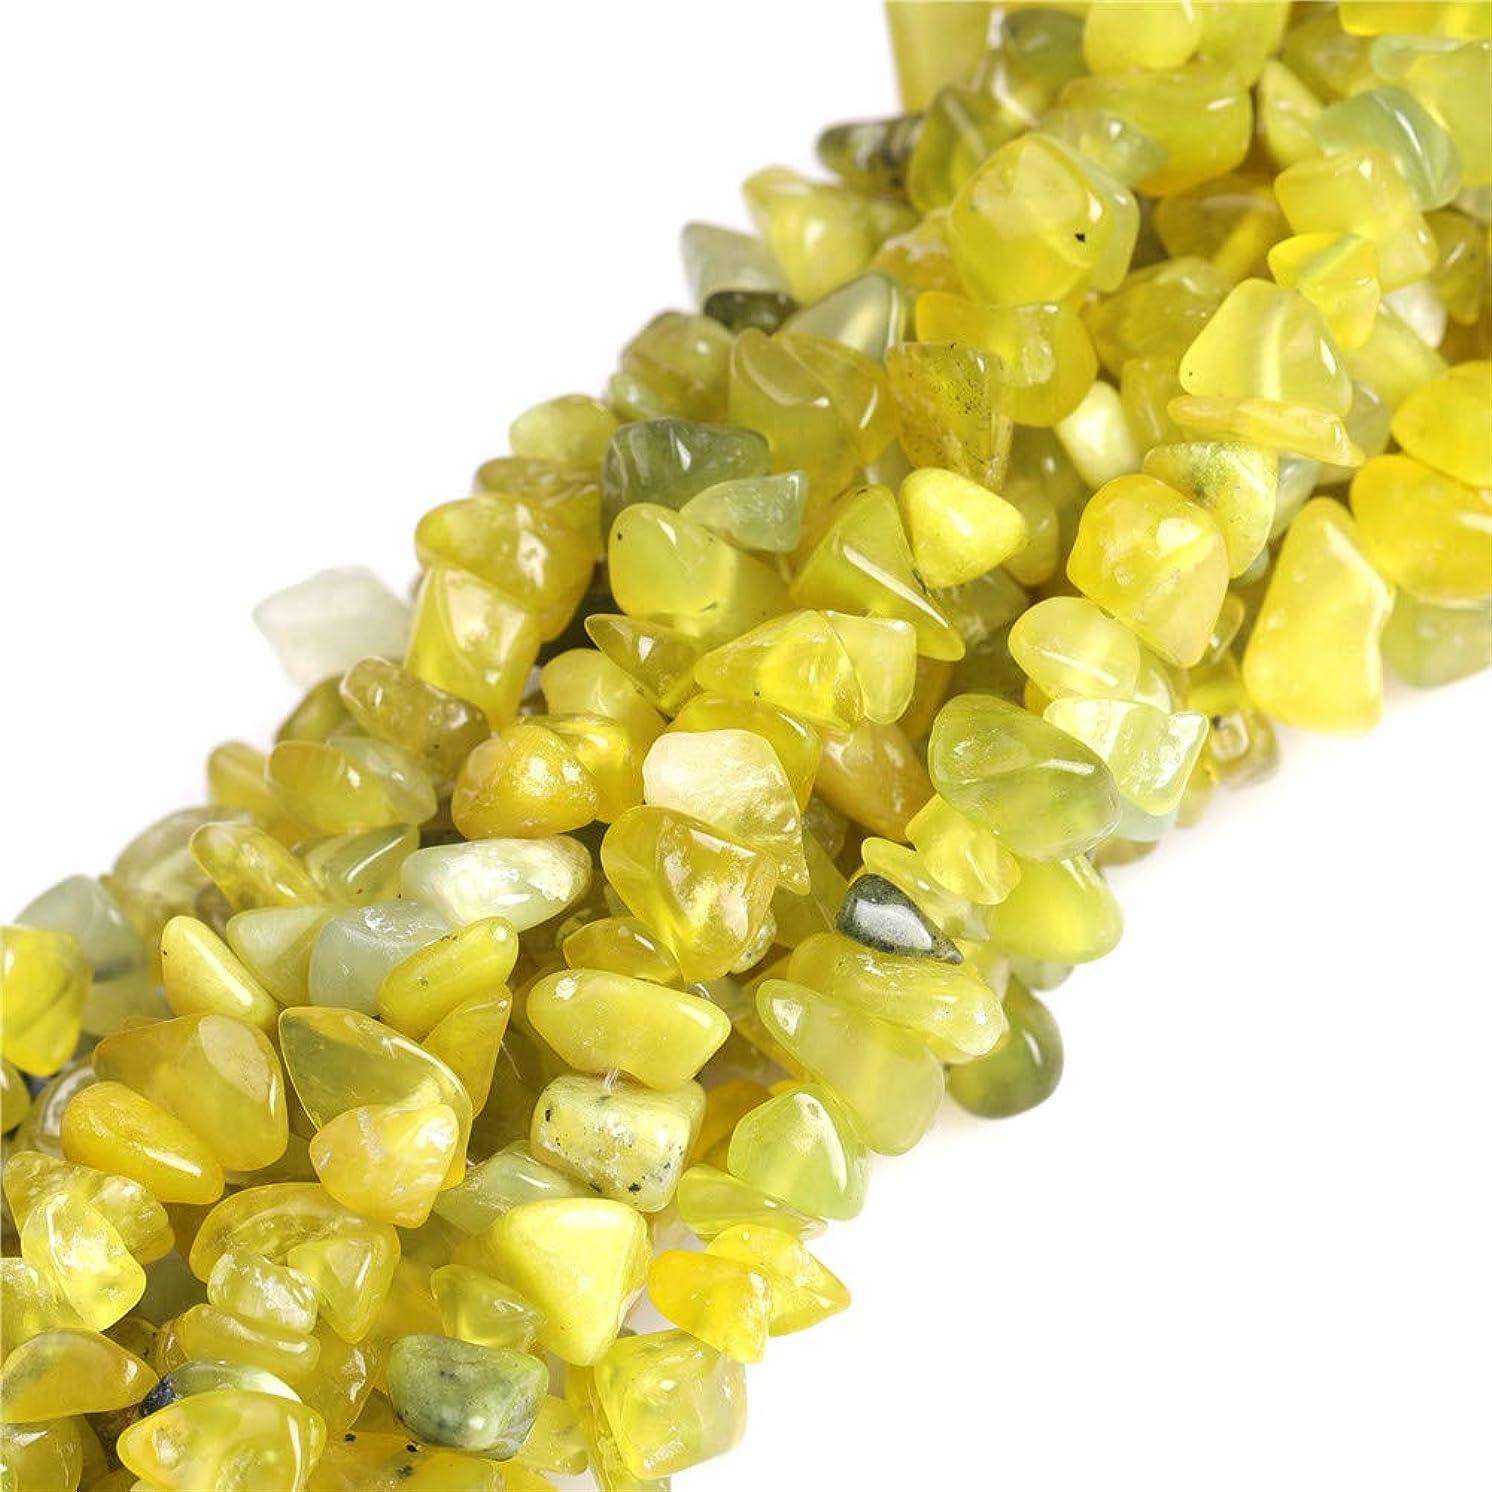 JOE FOREMAN 7-8mm Lemon Semi Precious Gemstone Chips Loose Beads for Jewelry Making DIY Handmade Craft Supplies 34